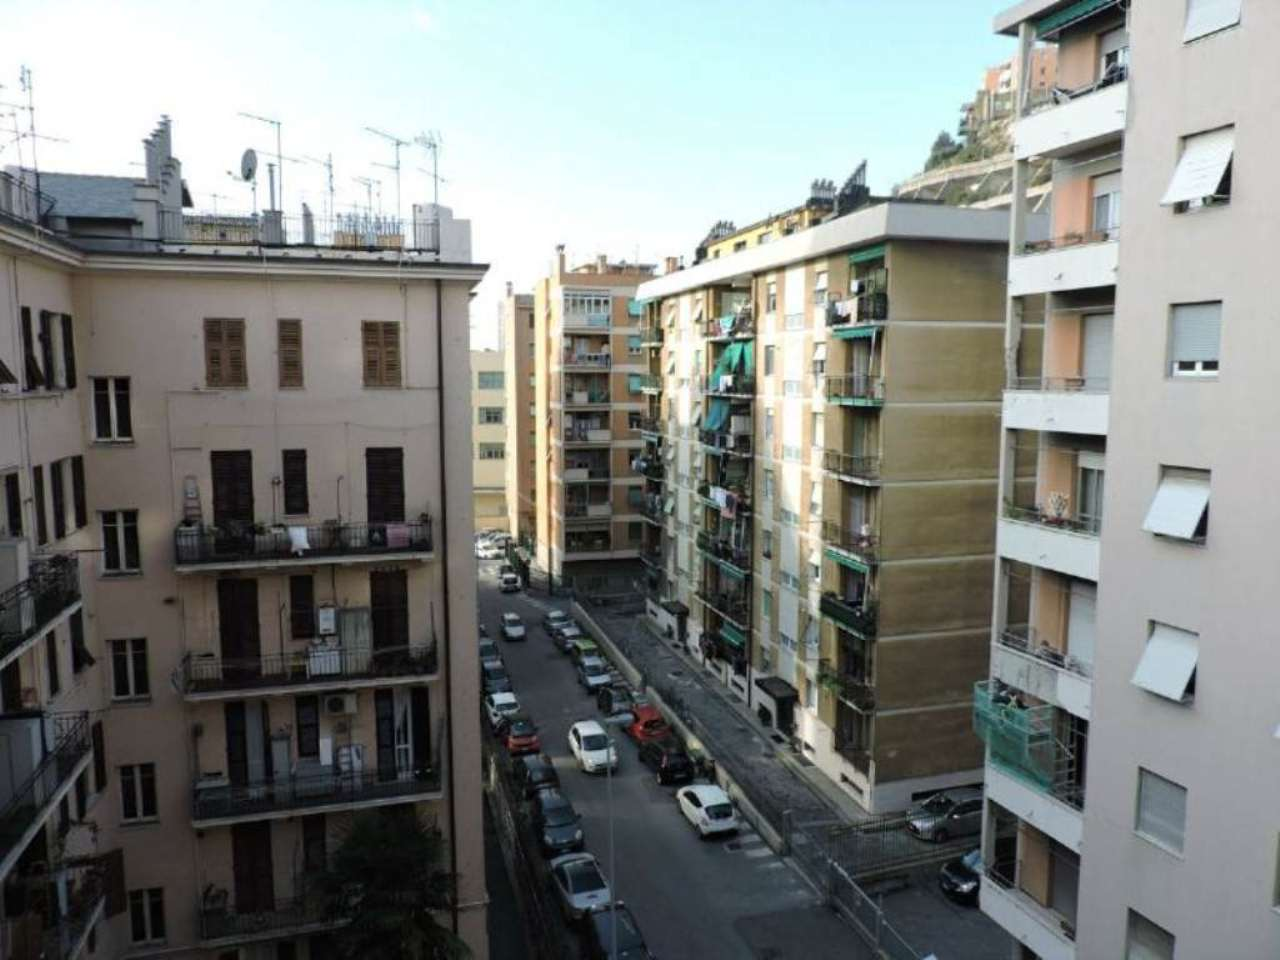 Bilocale Genova Via Dino Col 11